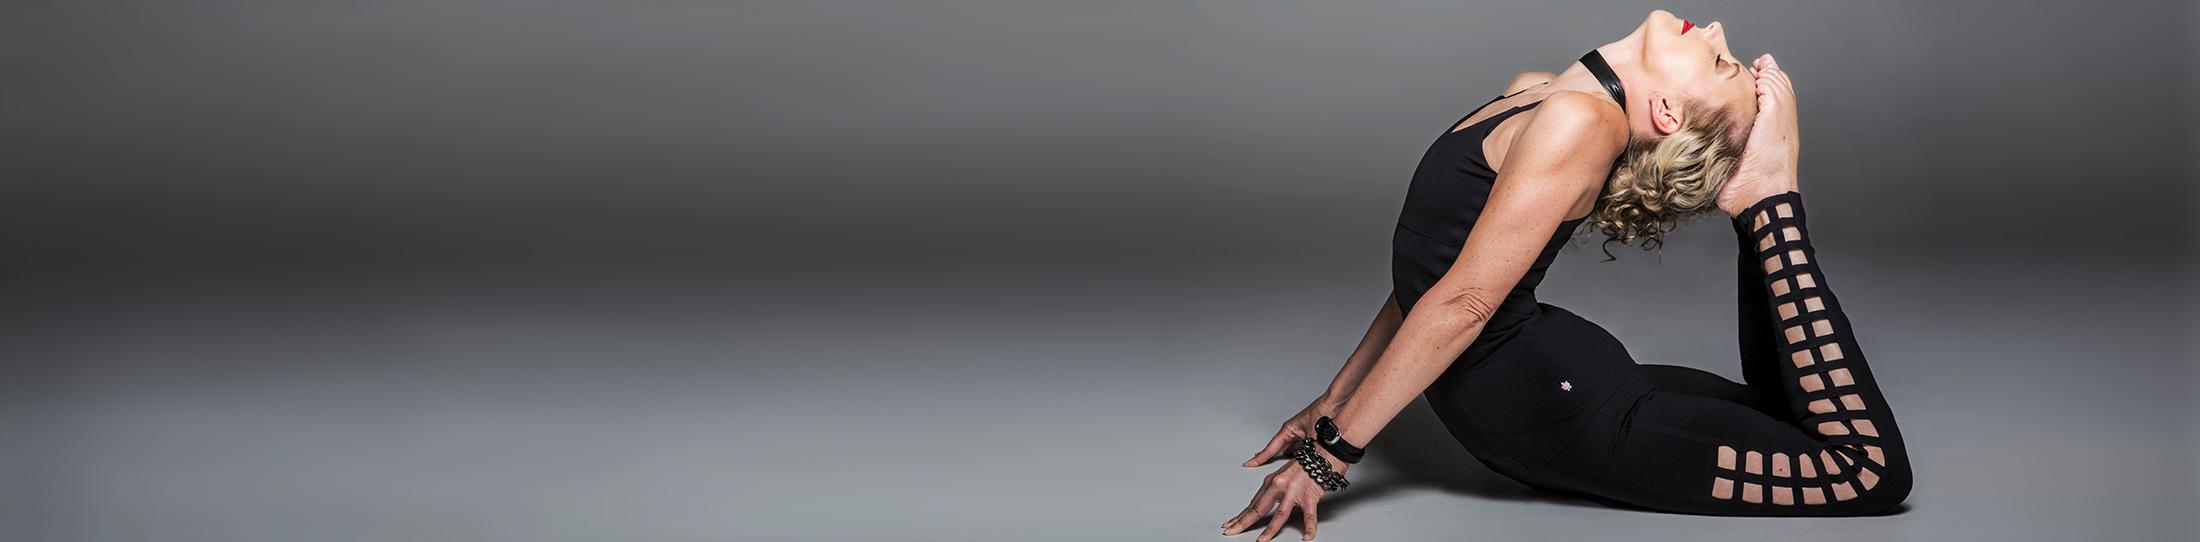 matrix-yoga-legging-warrior-collection-banner.jpg